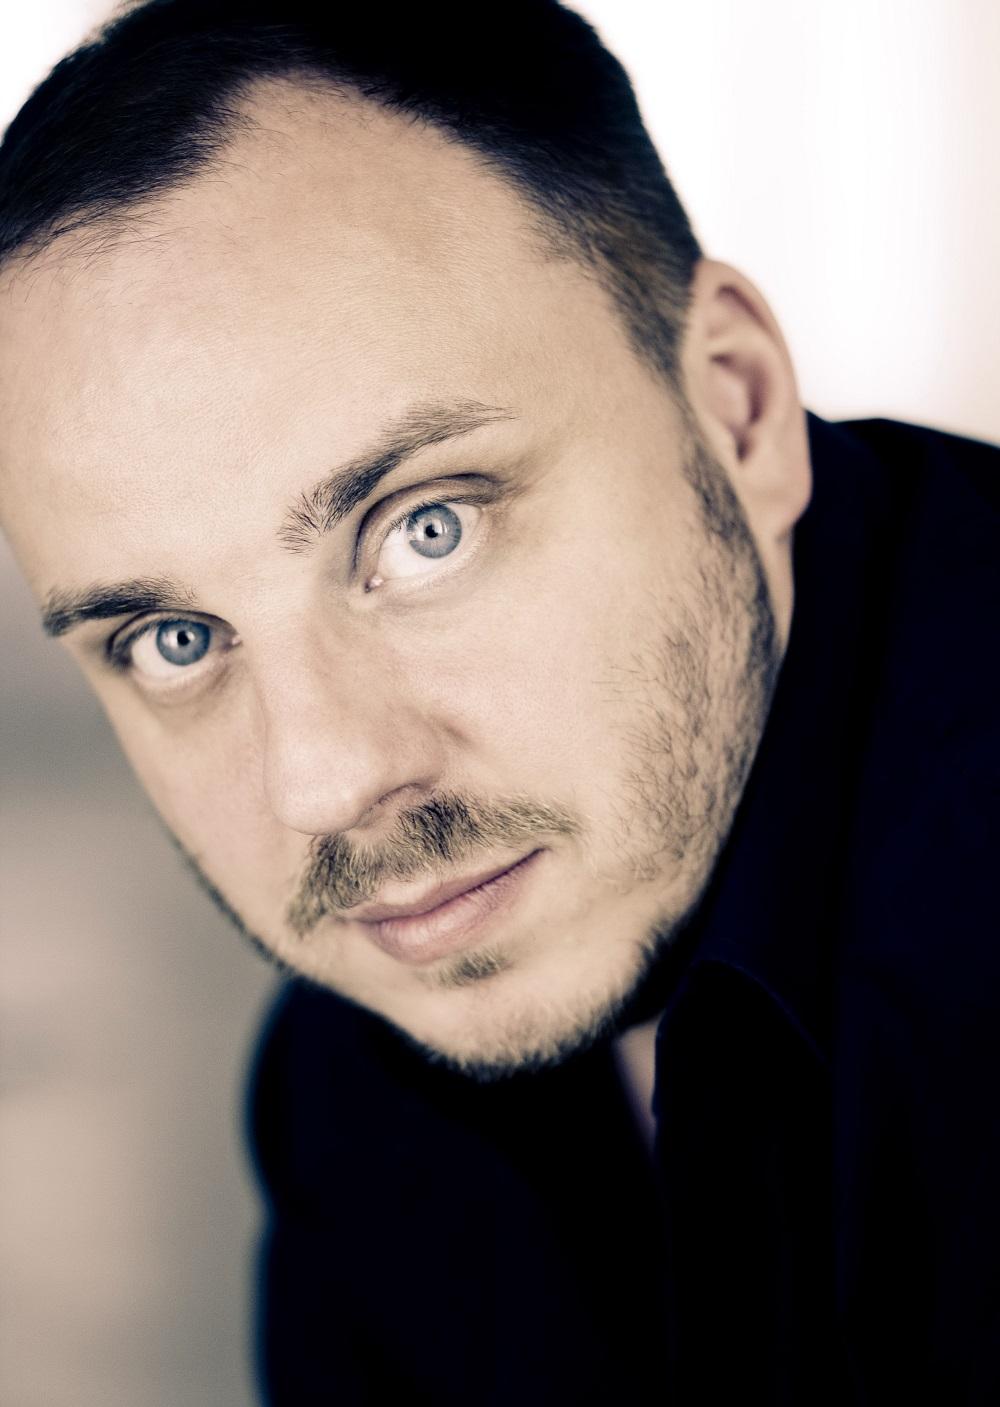 ph. Marco Borggreve for Harmonia Mundi 2010